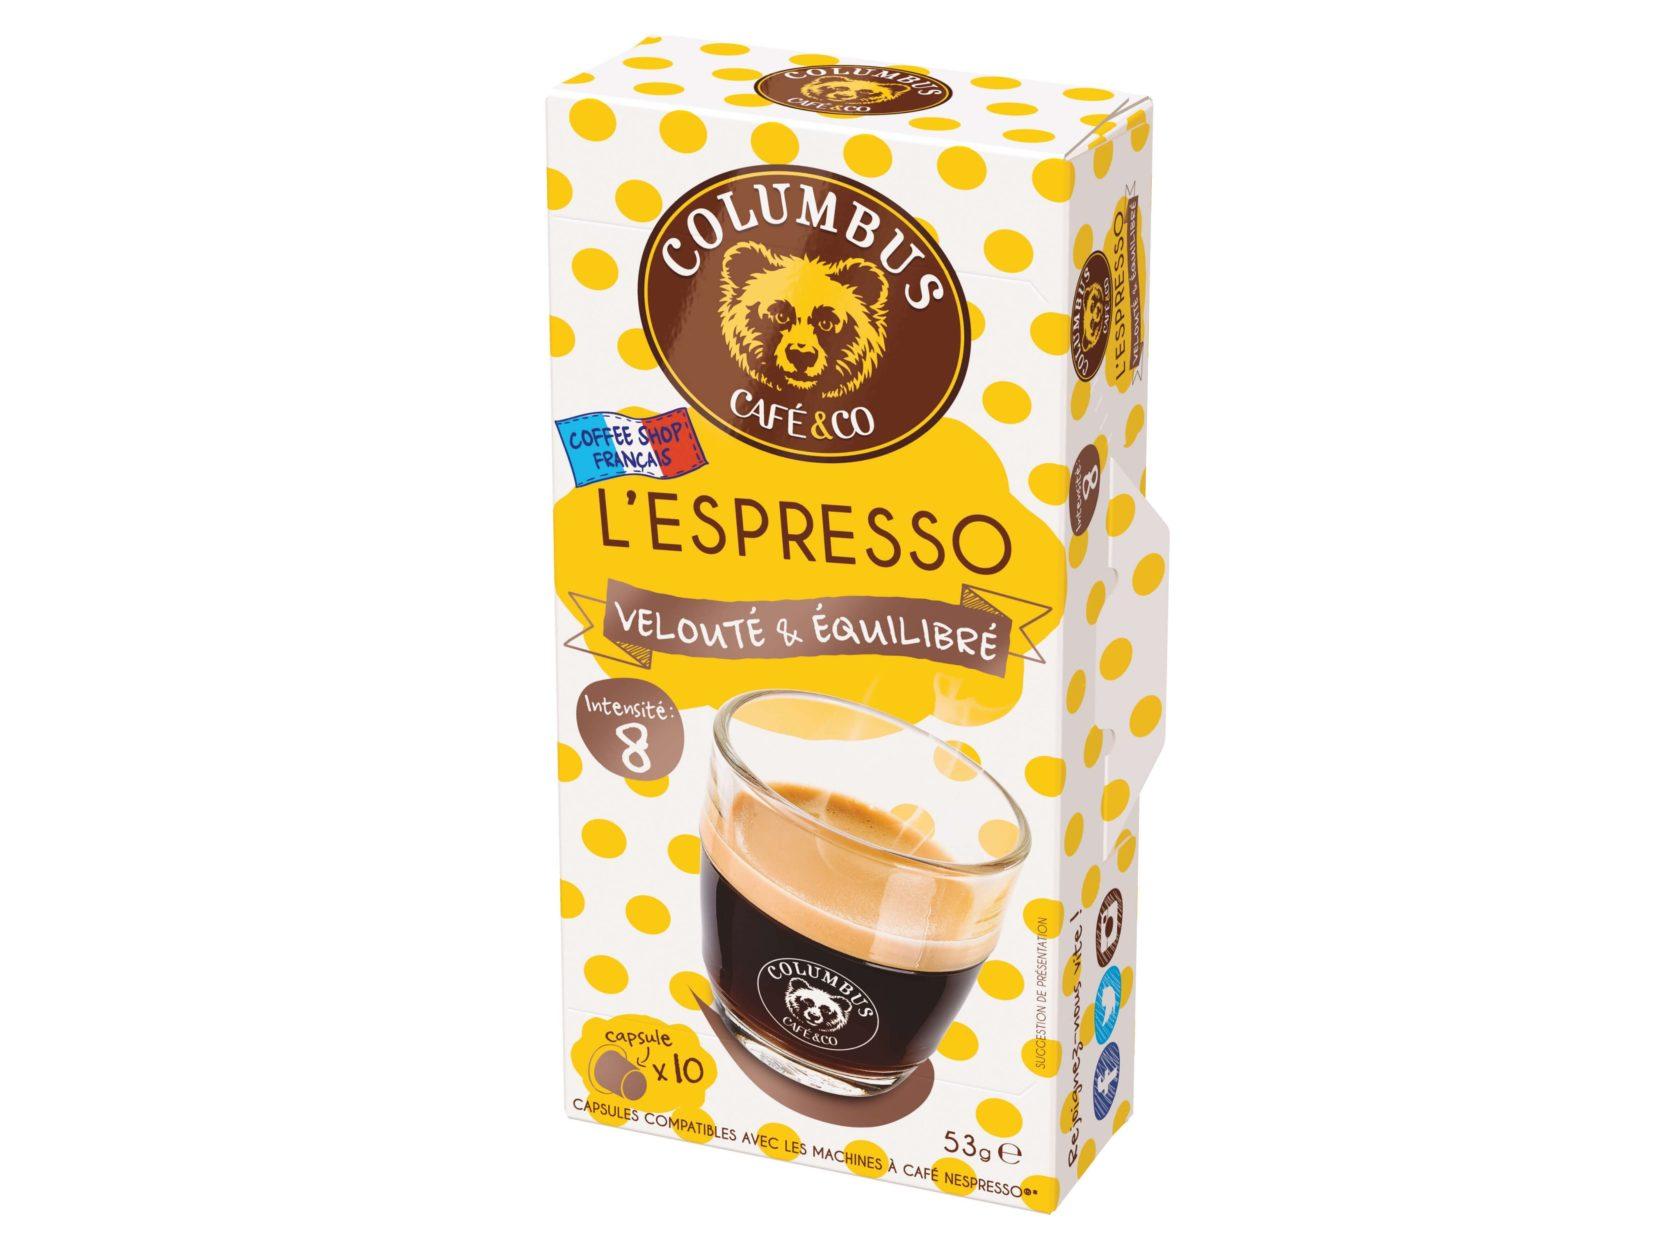 The Espresso Barista Blend® Nespresso® x 10